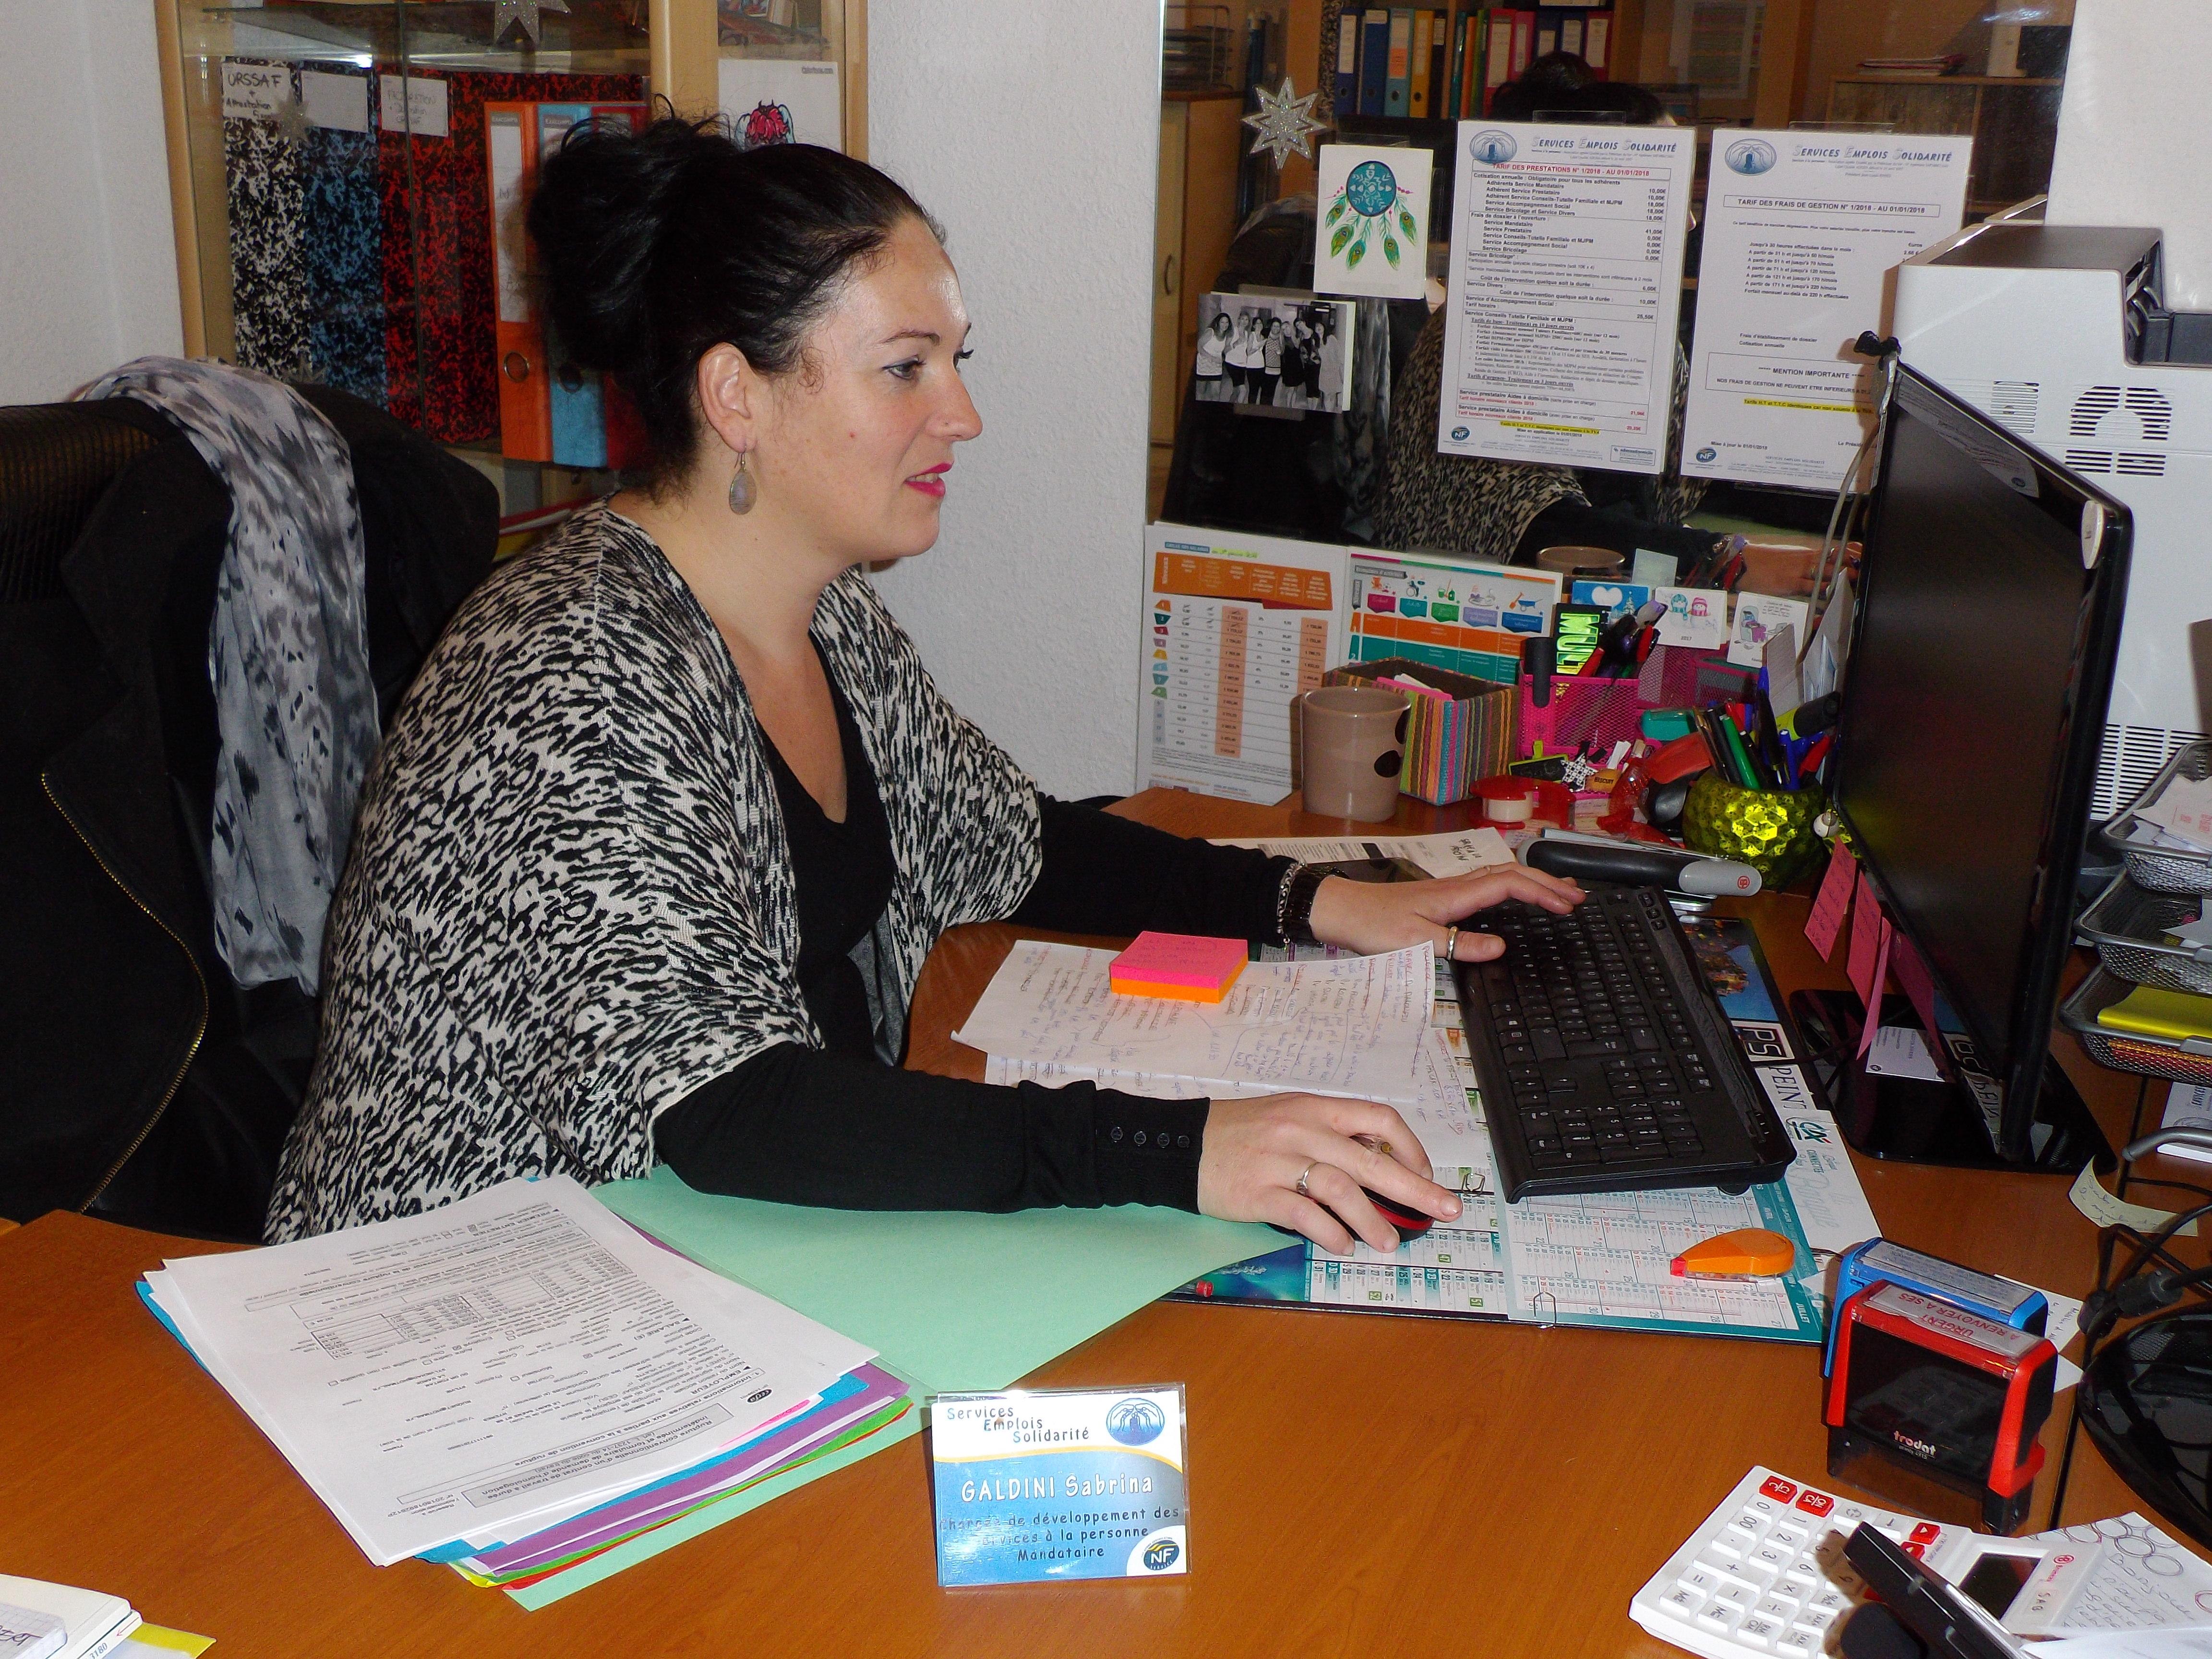 Sabrina GALDINI Responsable du service mandataire [object object] Mandataire IMGP2068